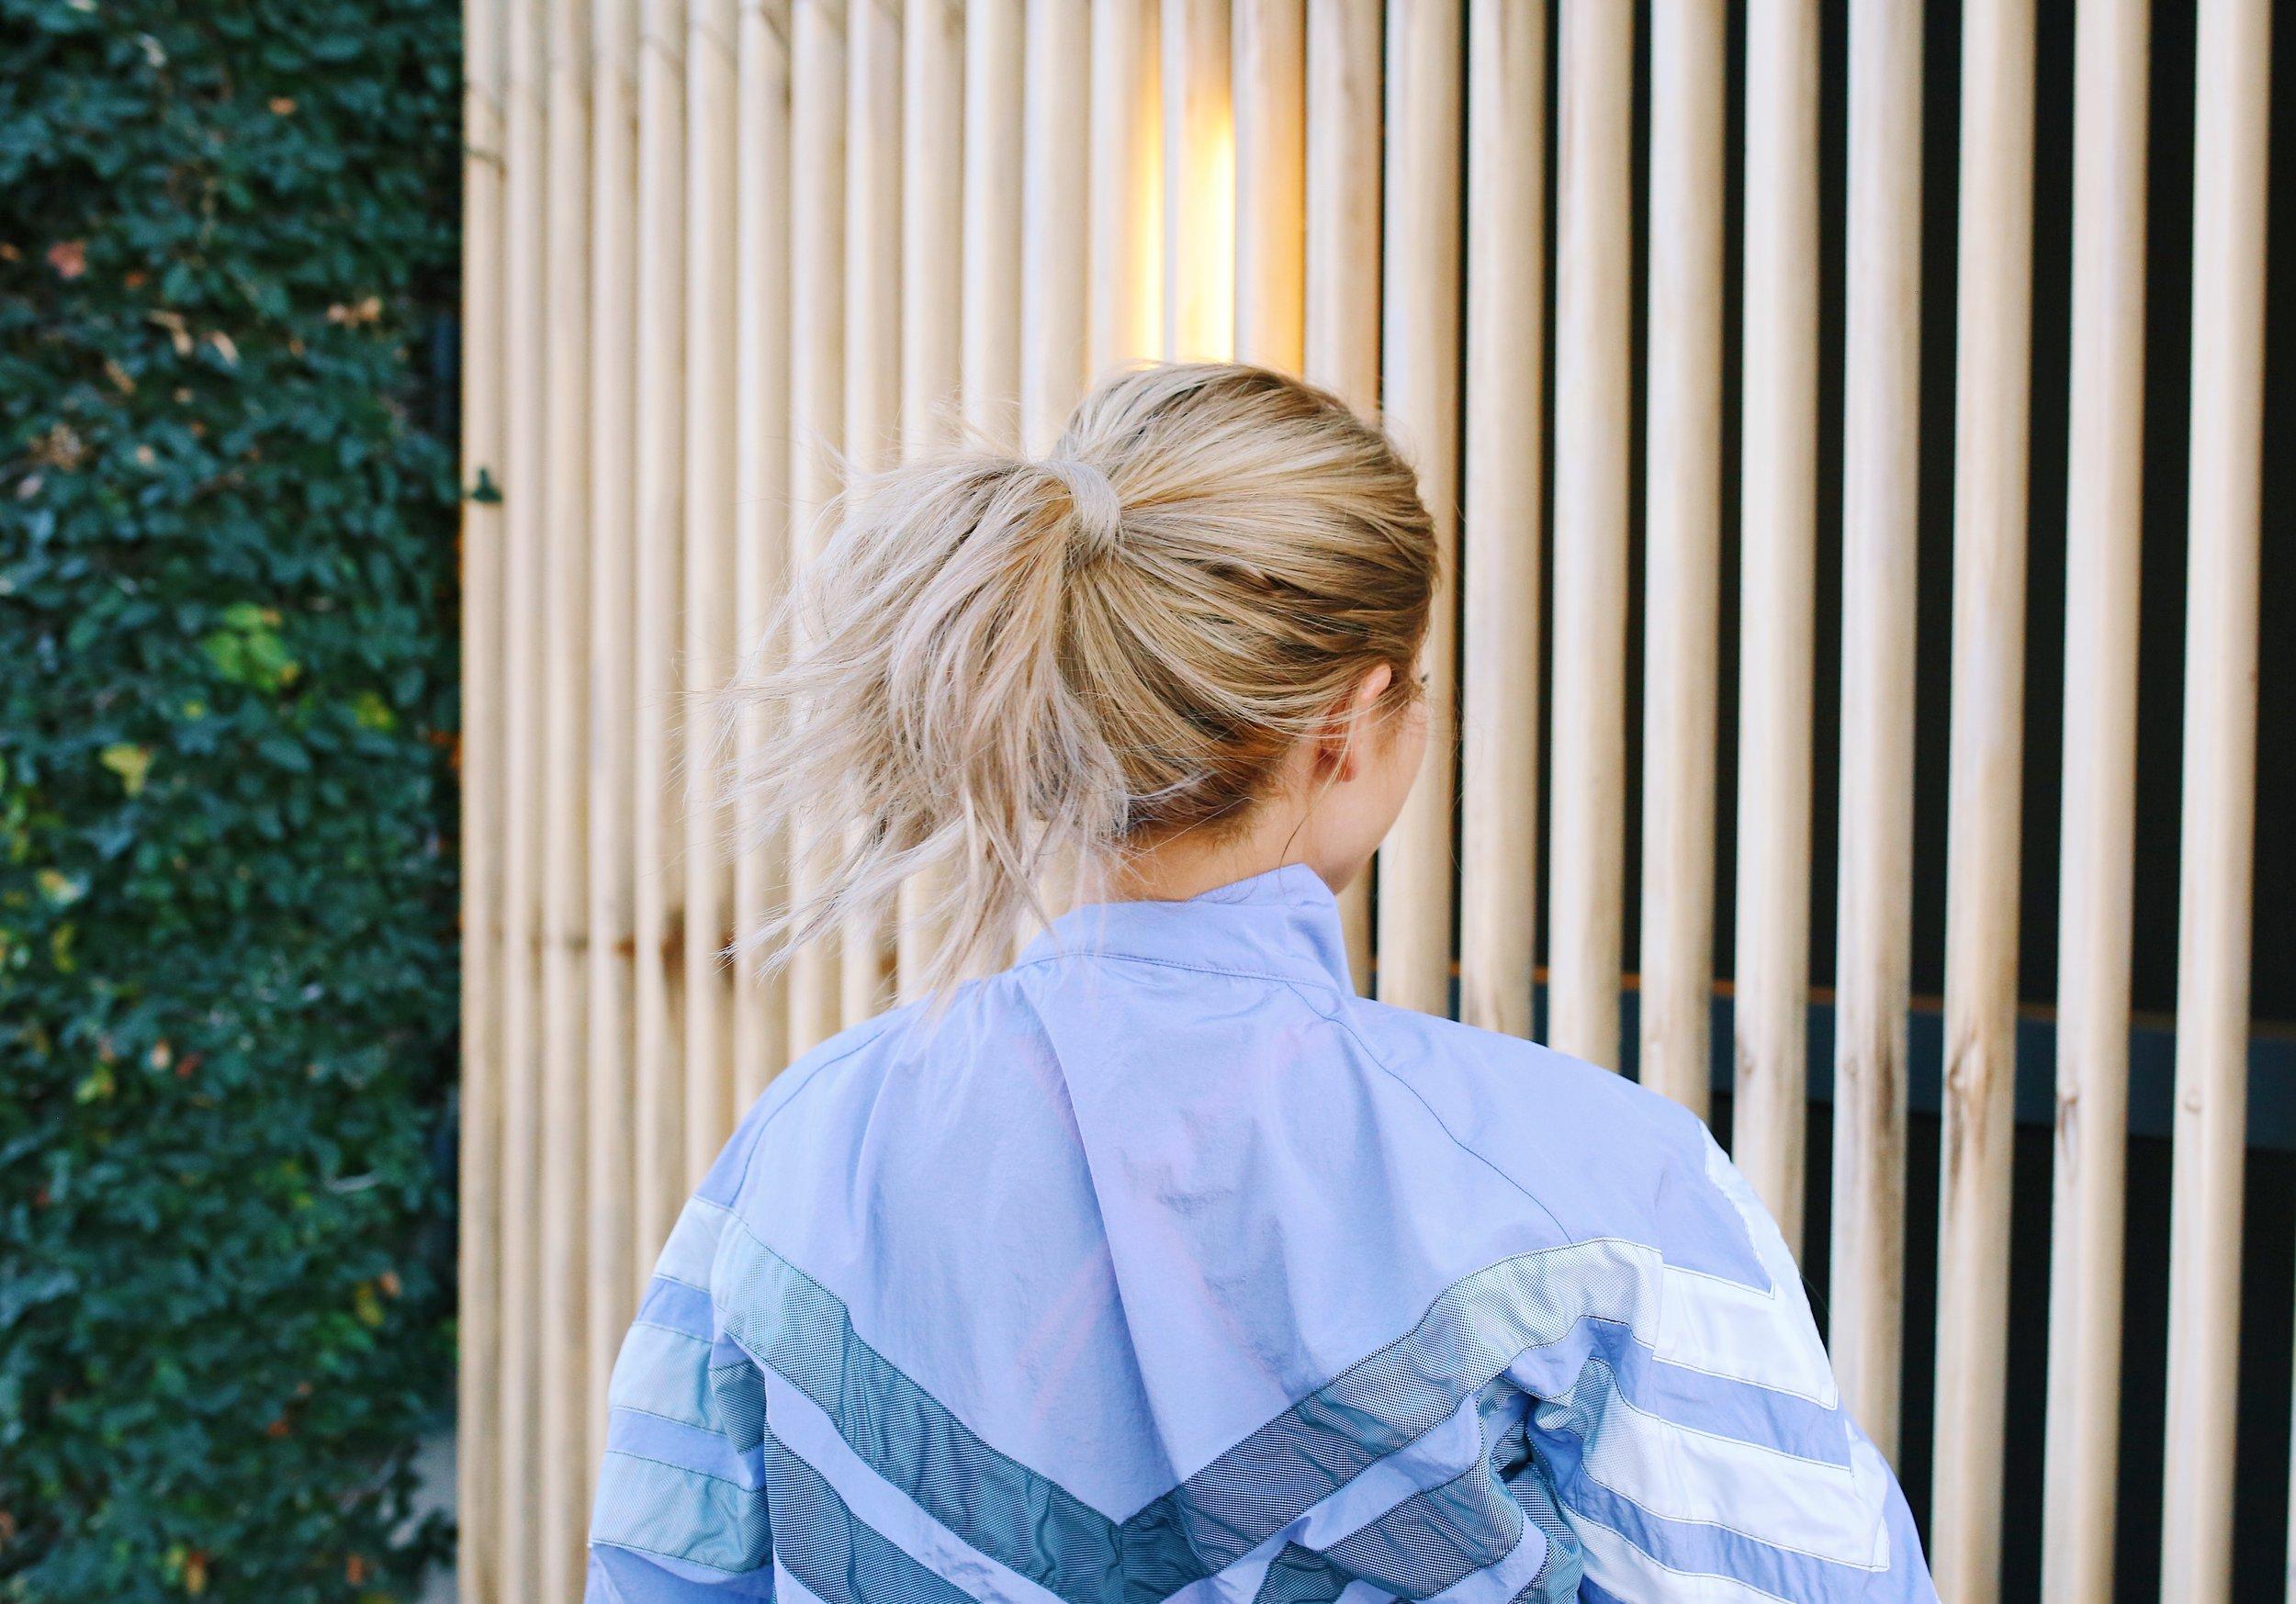 easy-hair-styles-for-the-gym-remi-ishizuka-pony-tail-2.jpg